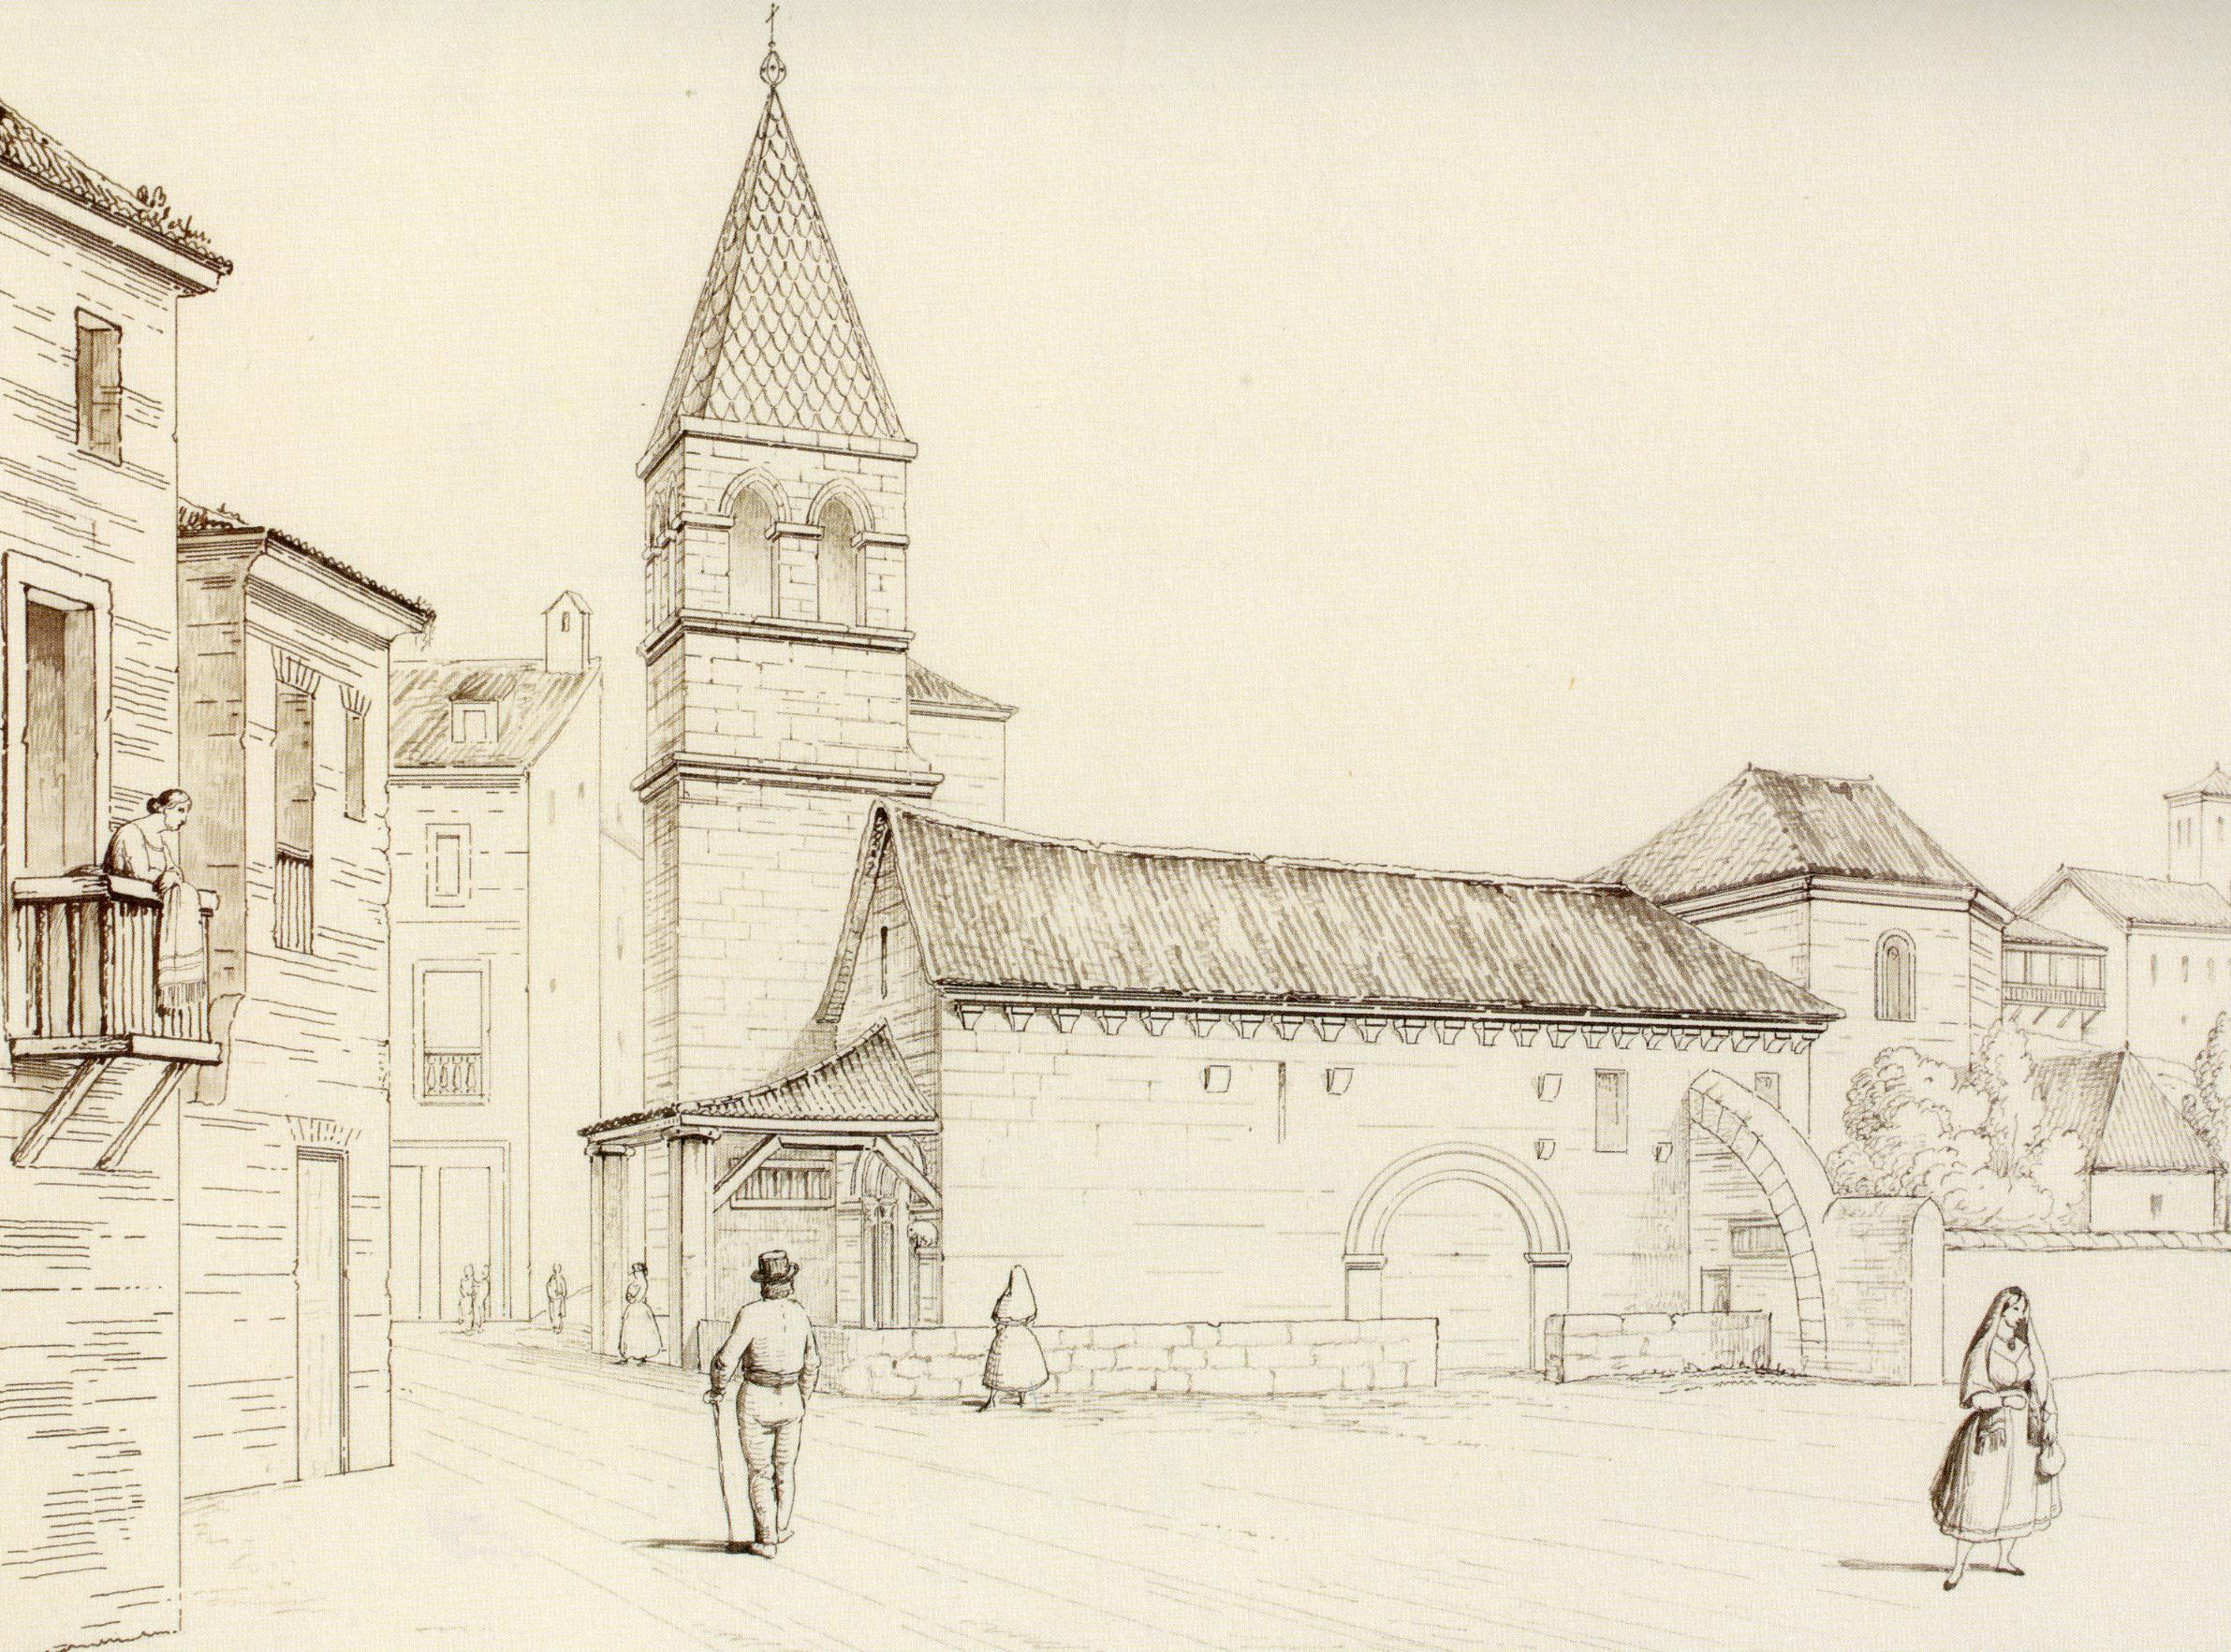 San Leonardo Avrial